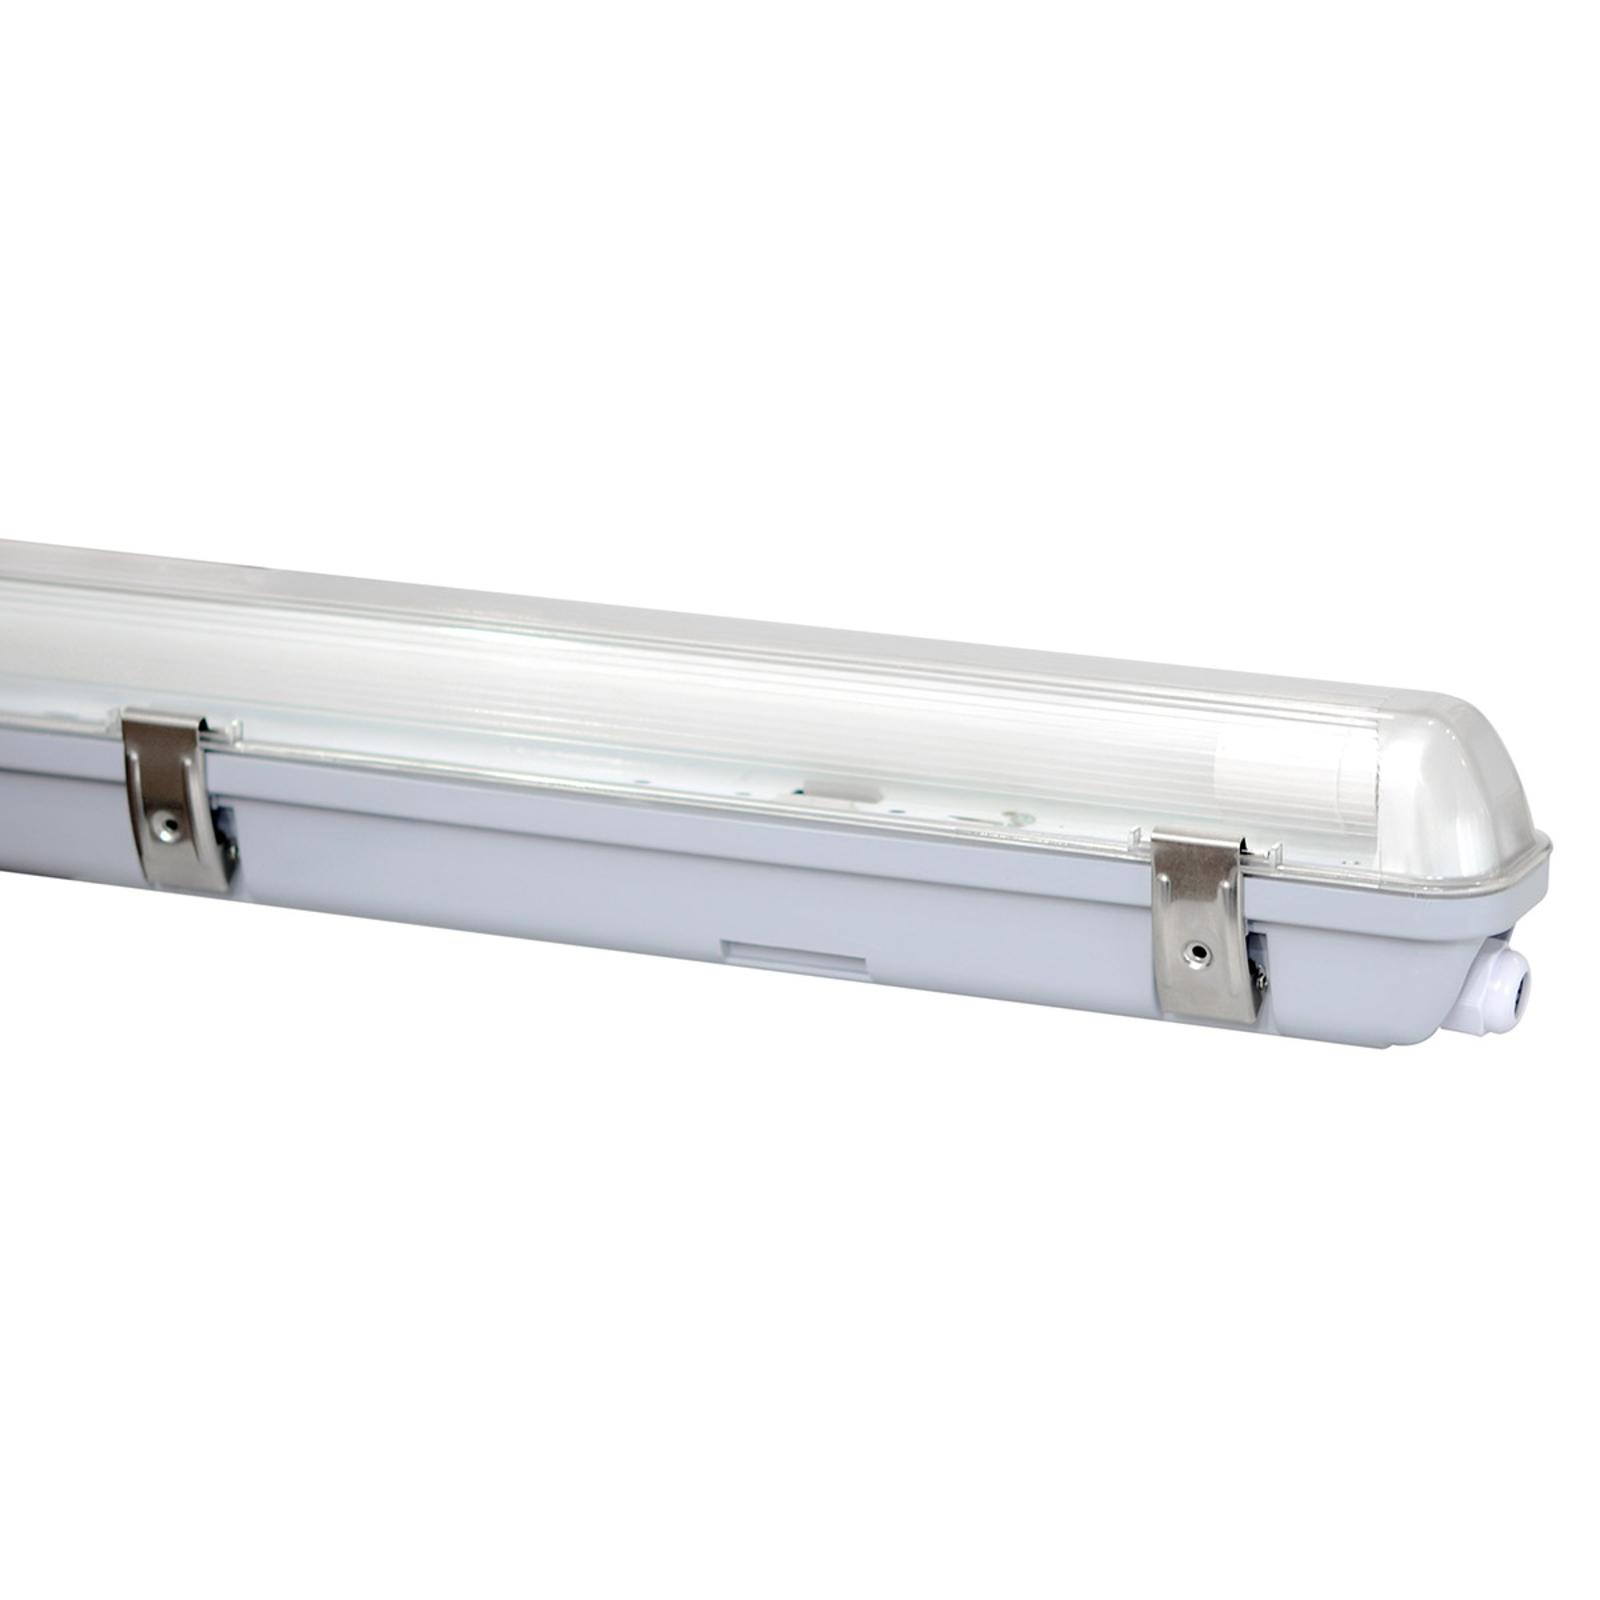 LED-Feuchtraumleuchte Niehl 18 IP65 18W